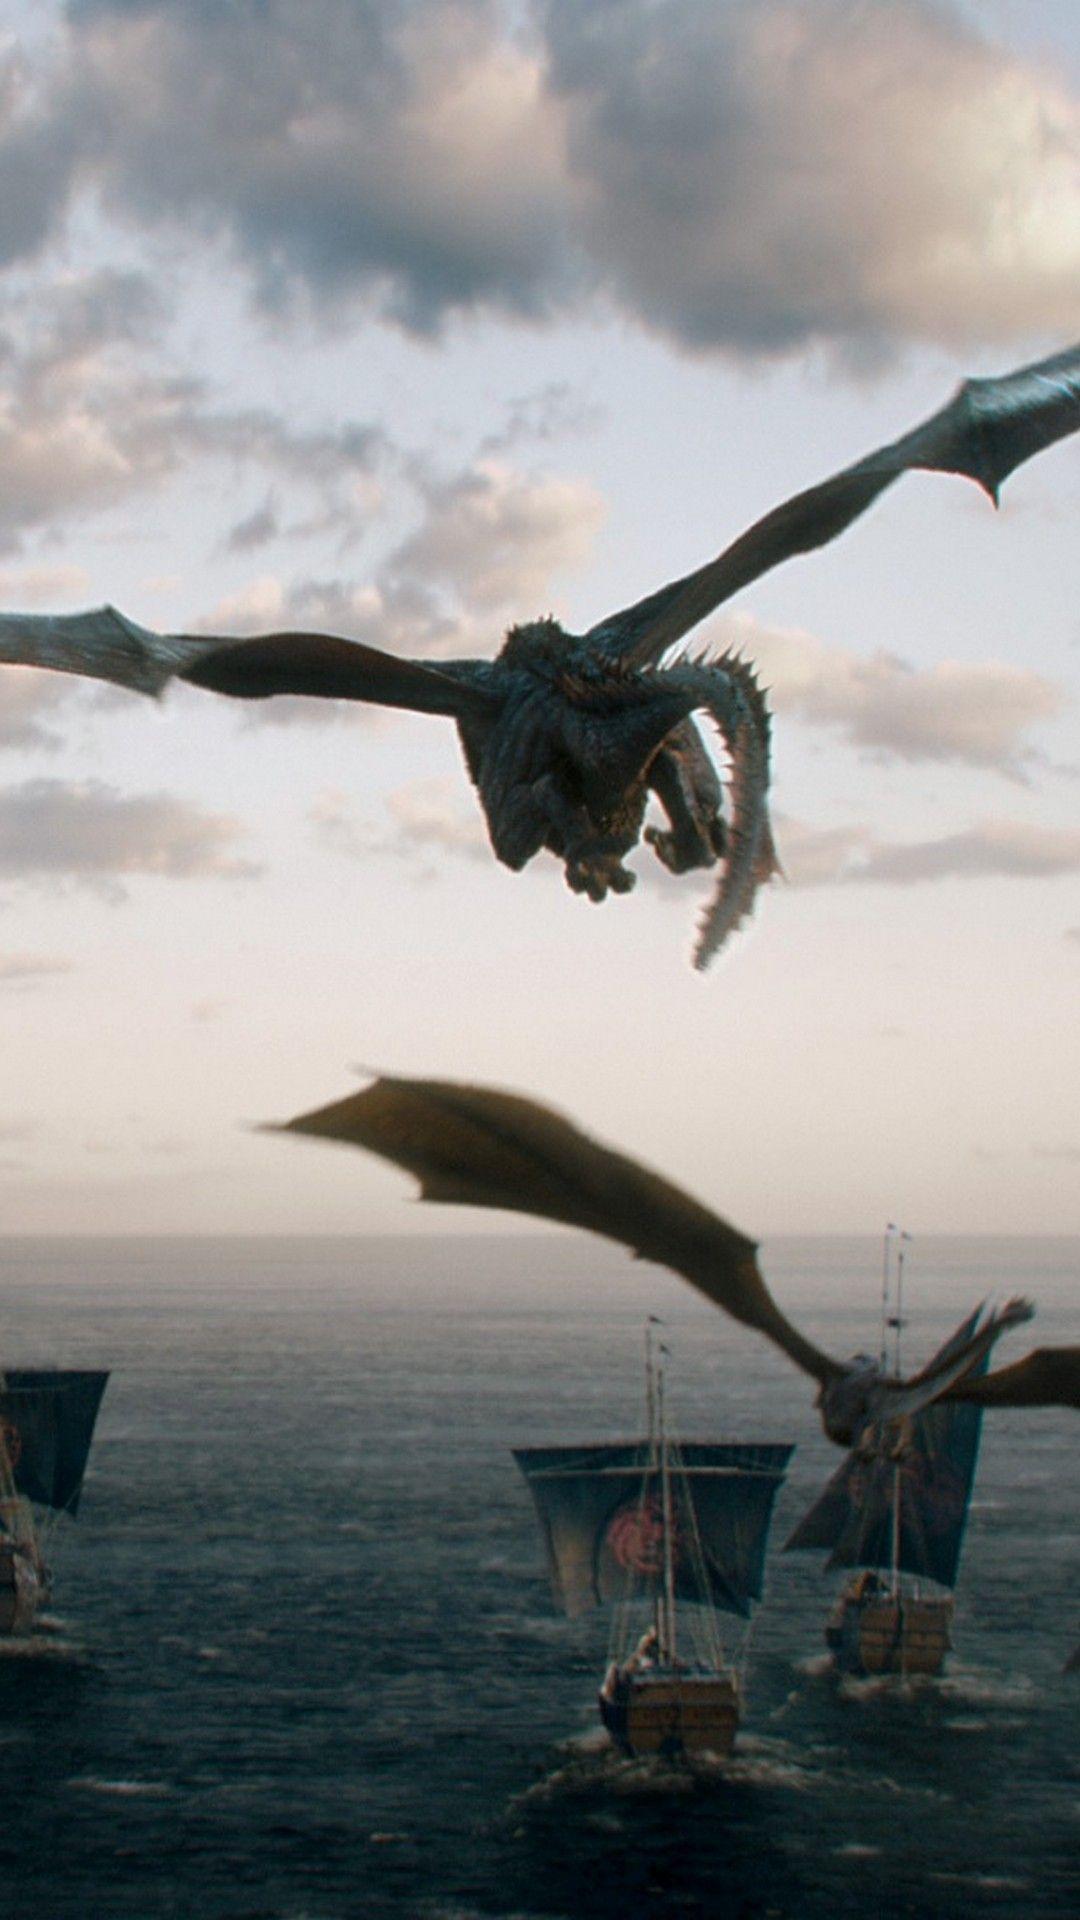 Game Of Thrones Dragons Wallpaper For Iphone Juego De